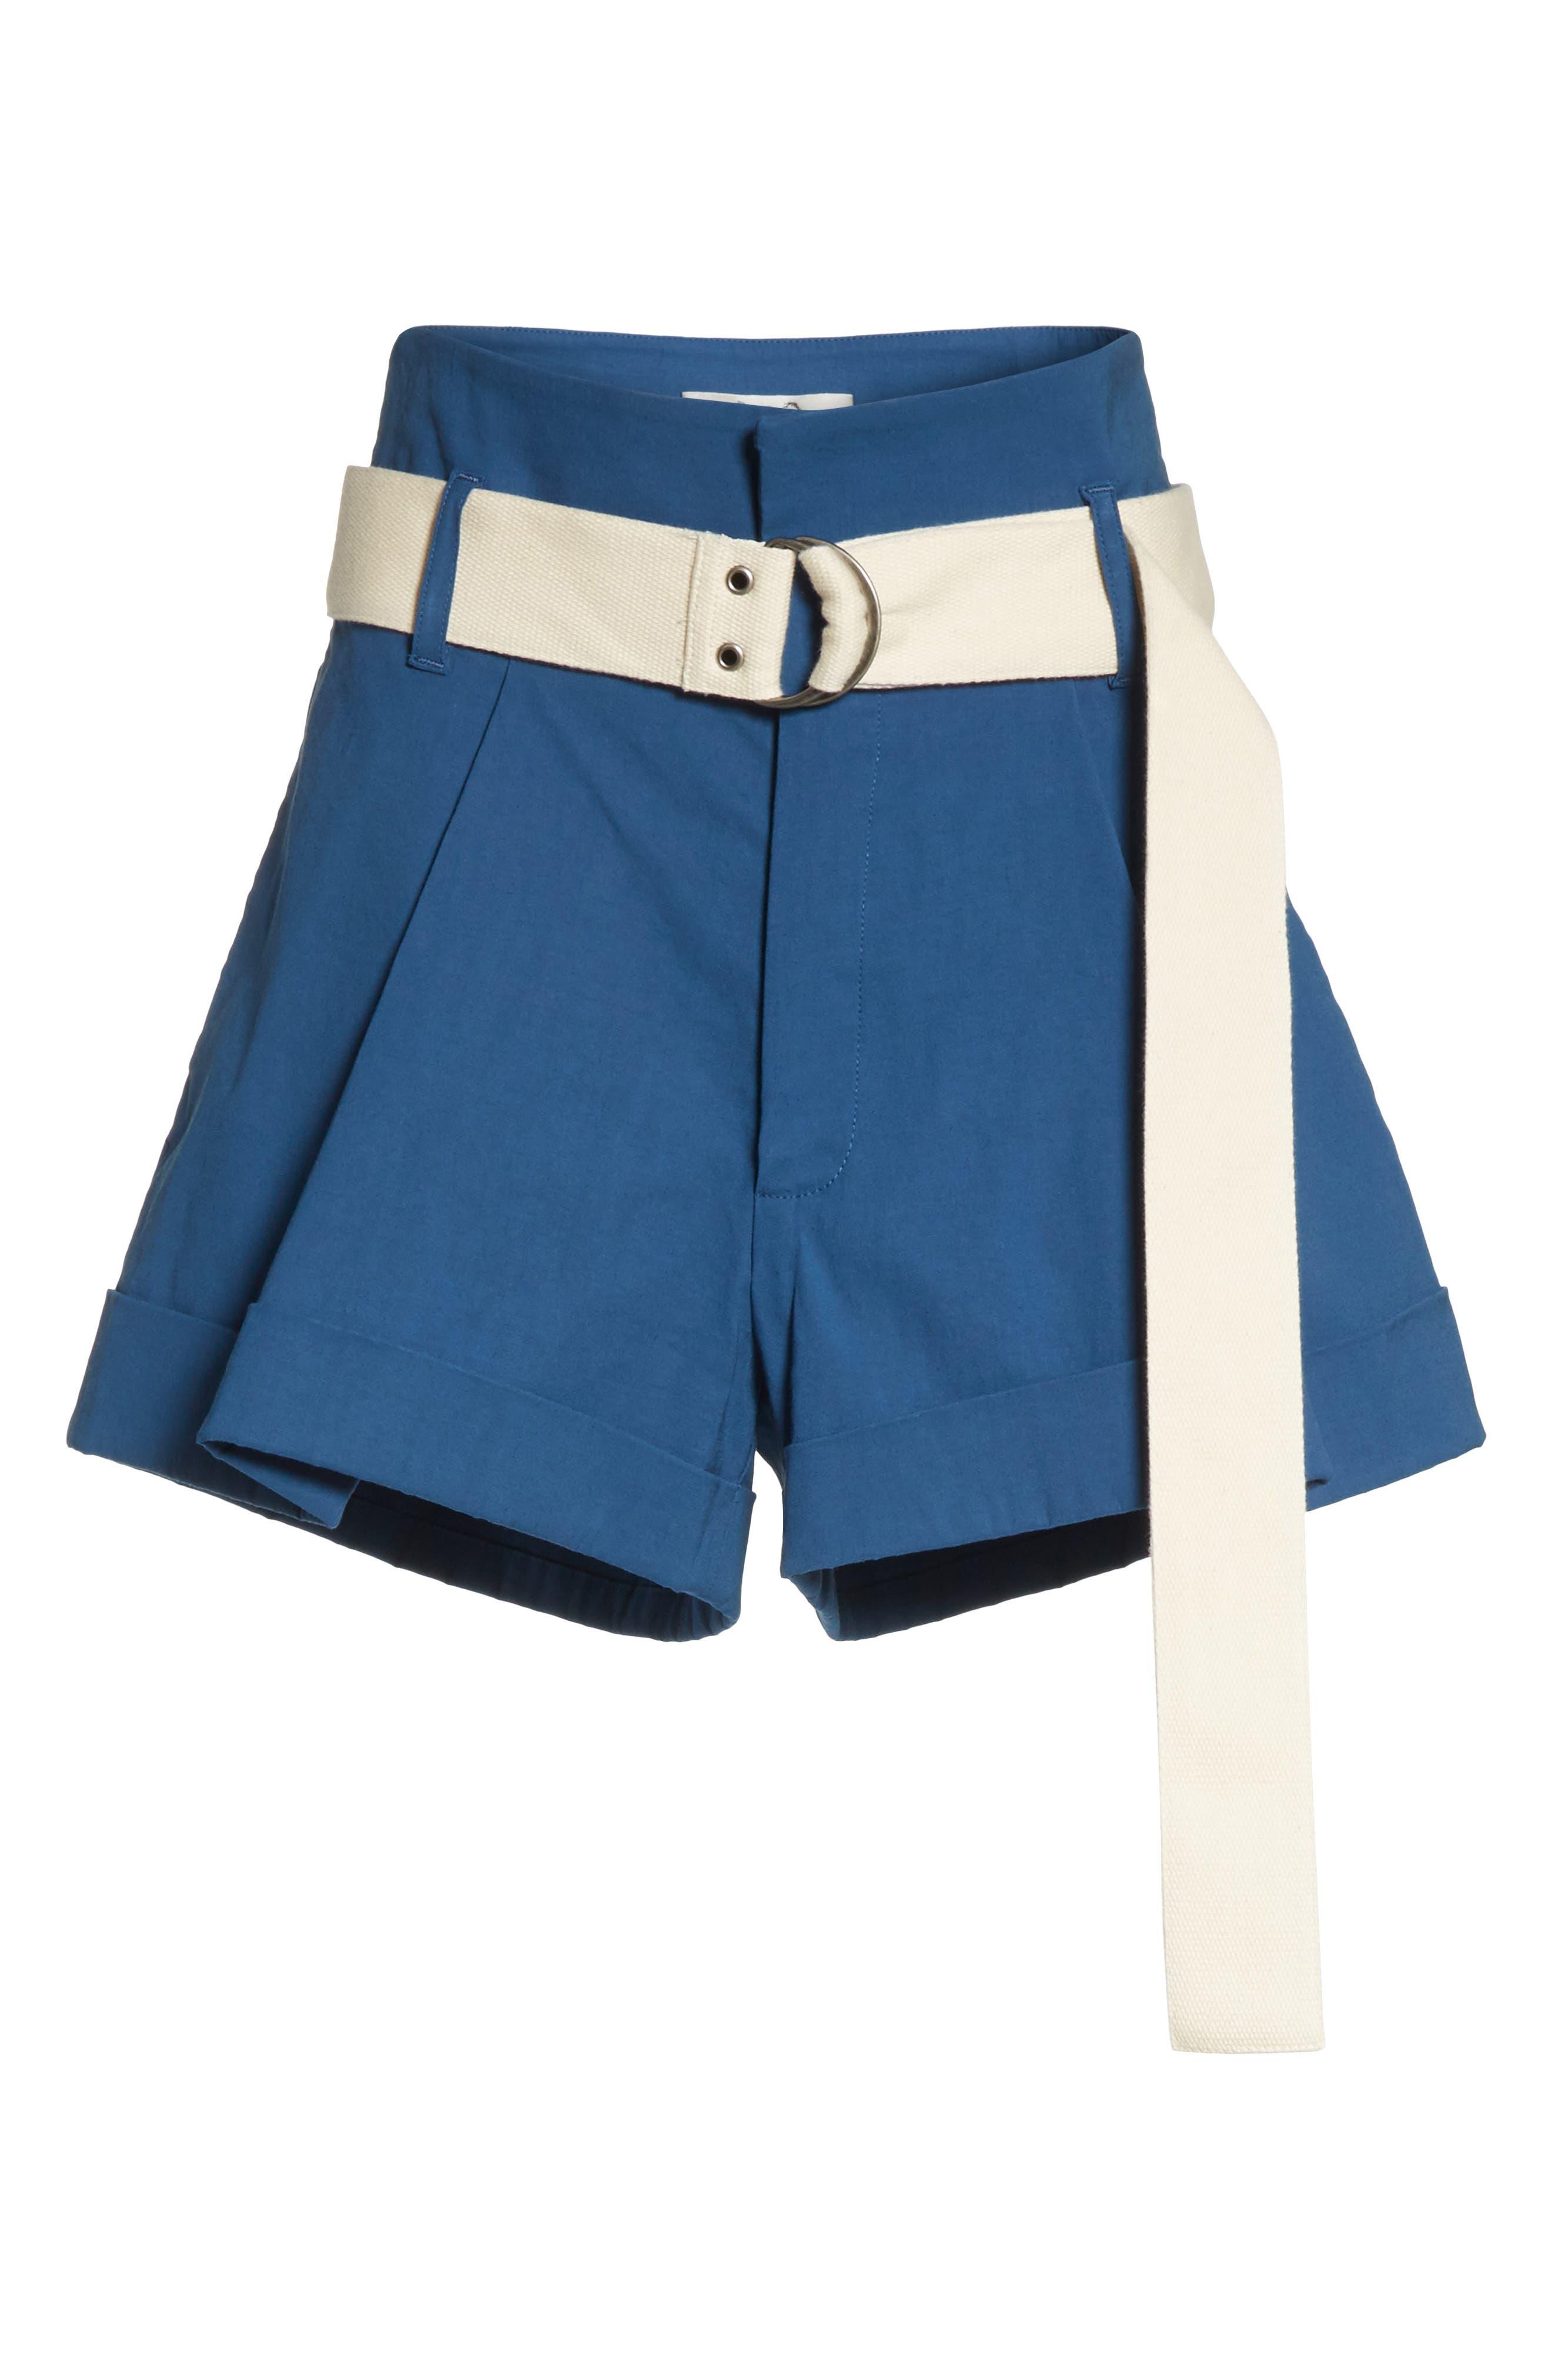 Poppy Belted Cotton & Linen Blend Shorts,                             Alternate thumbnail 6, color,                             400